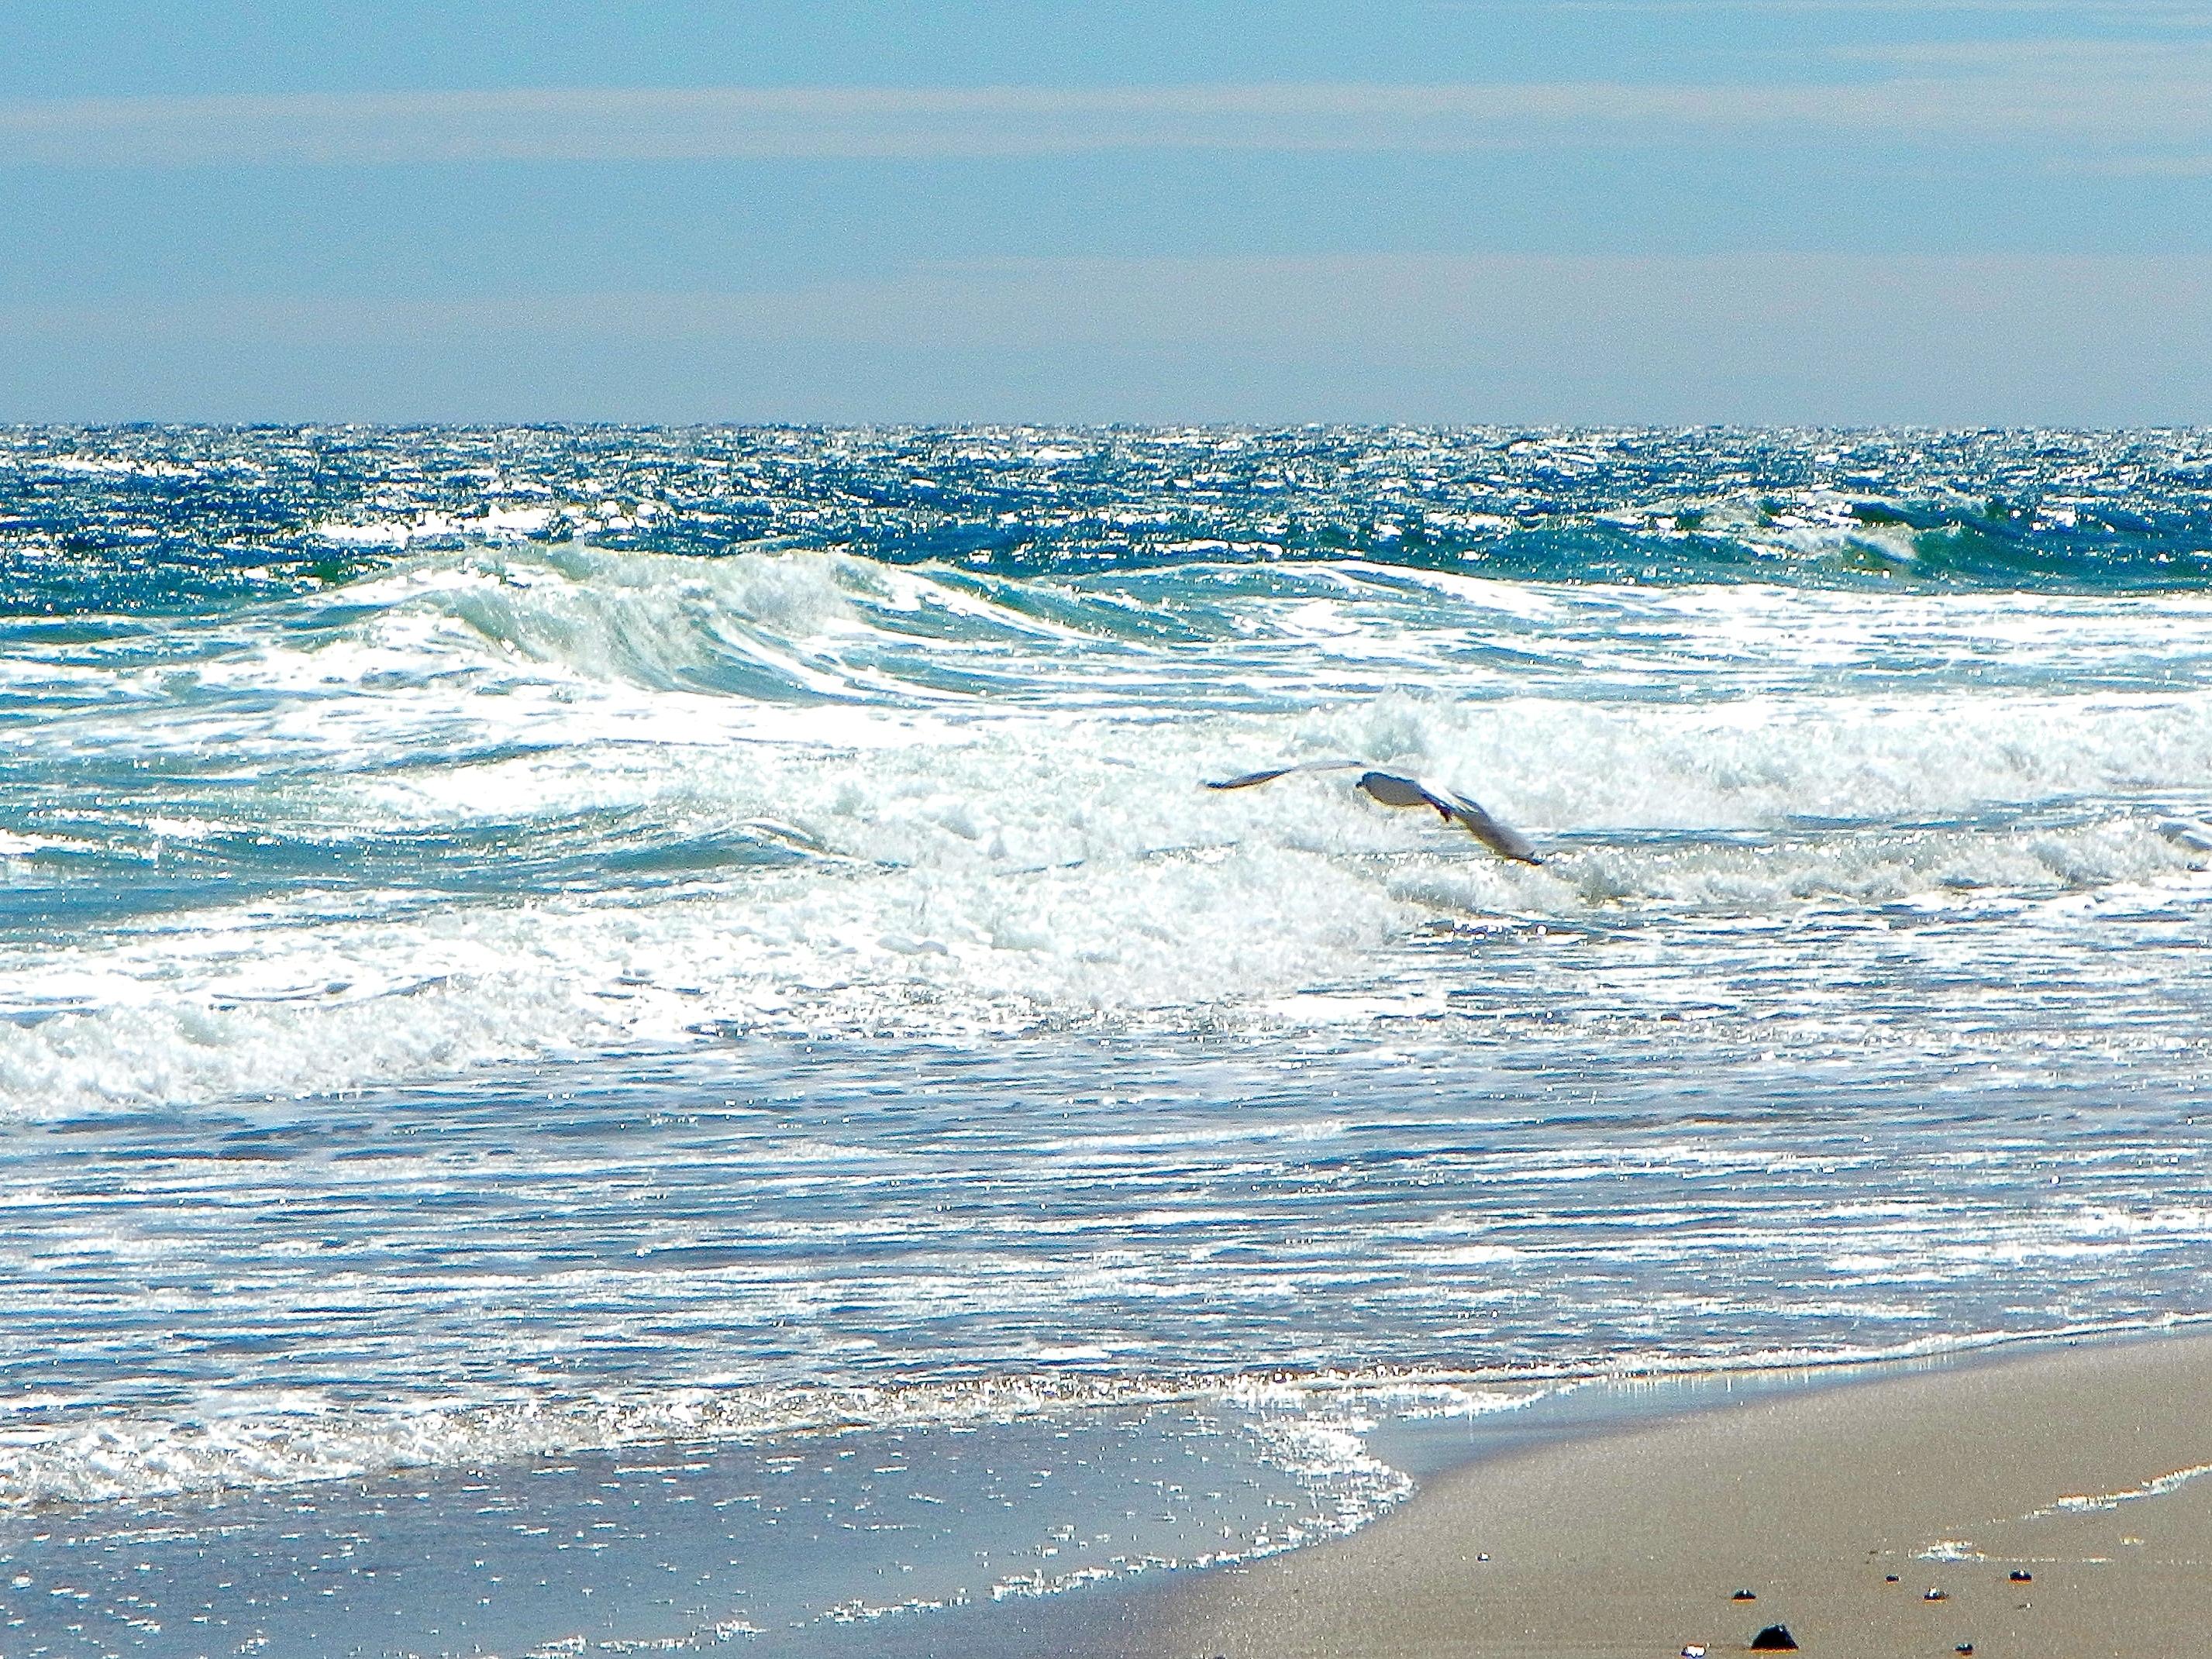 Lonely gull along Cape Cod Shoreline